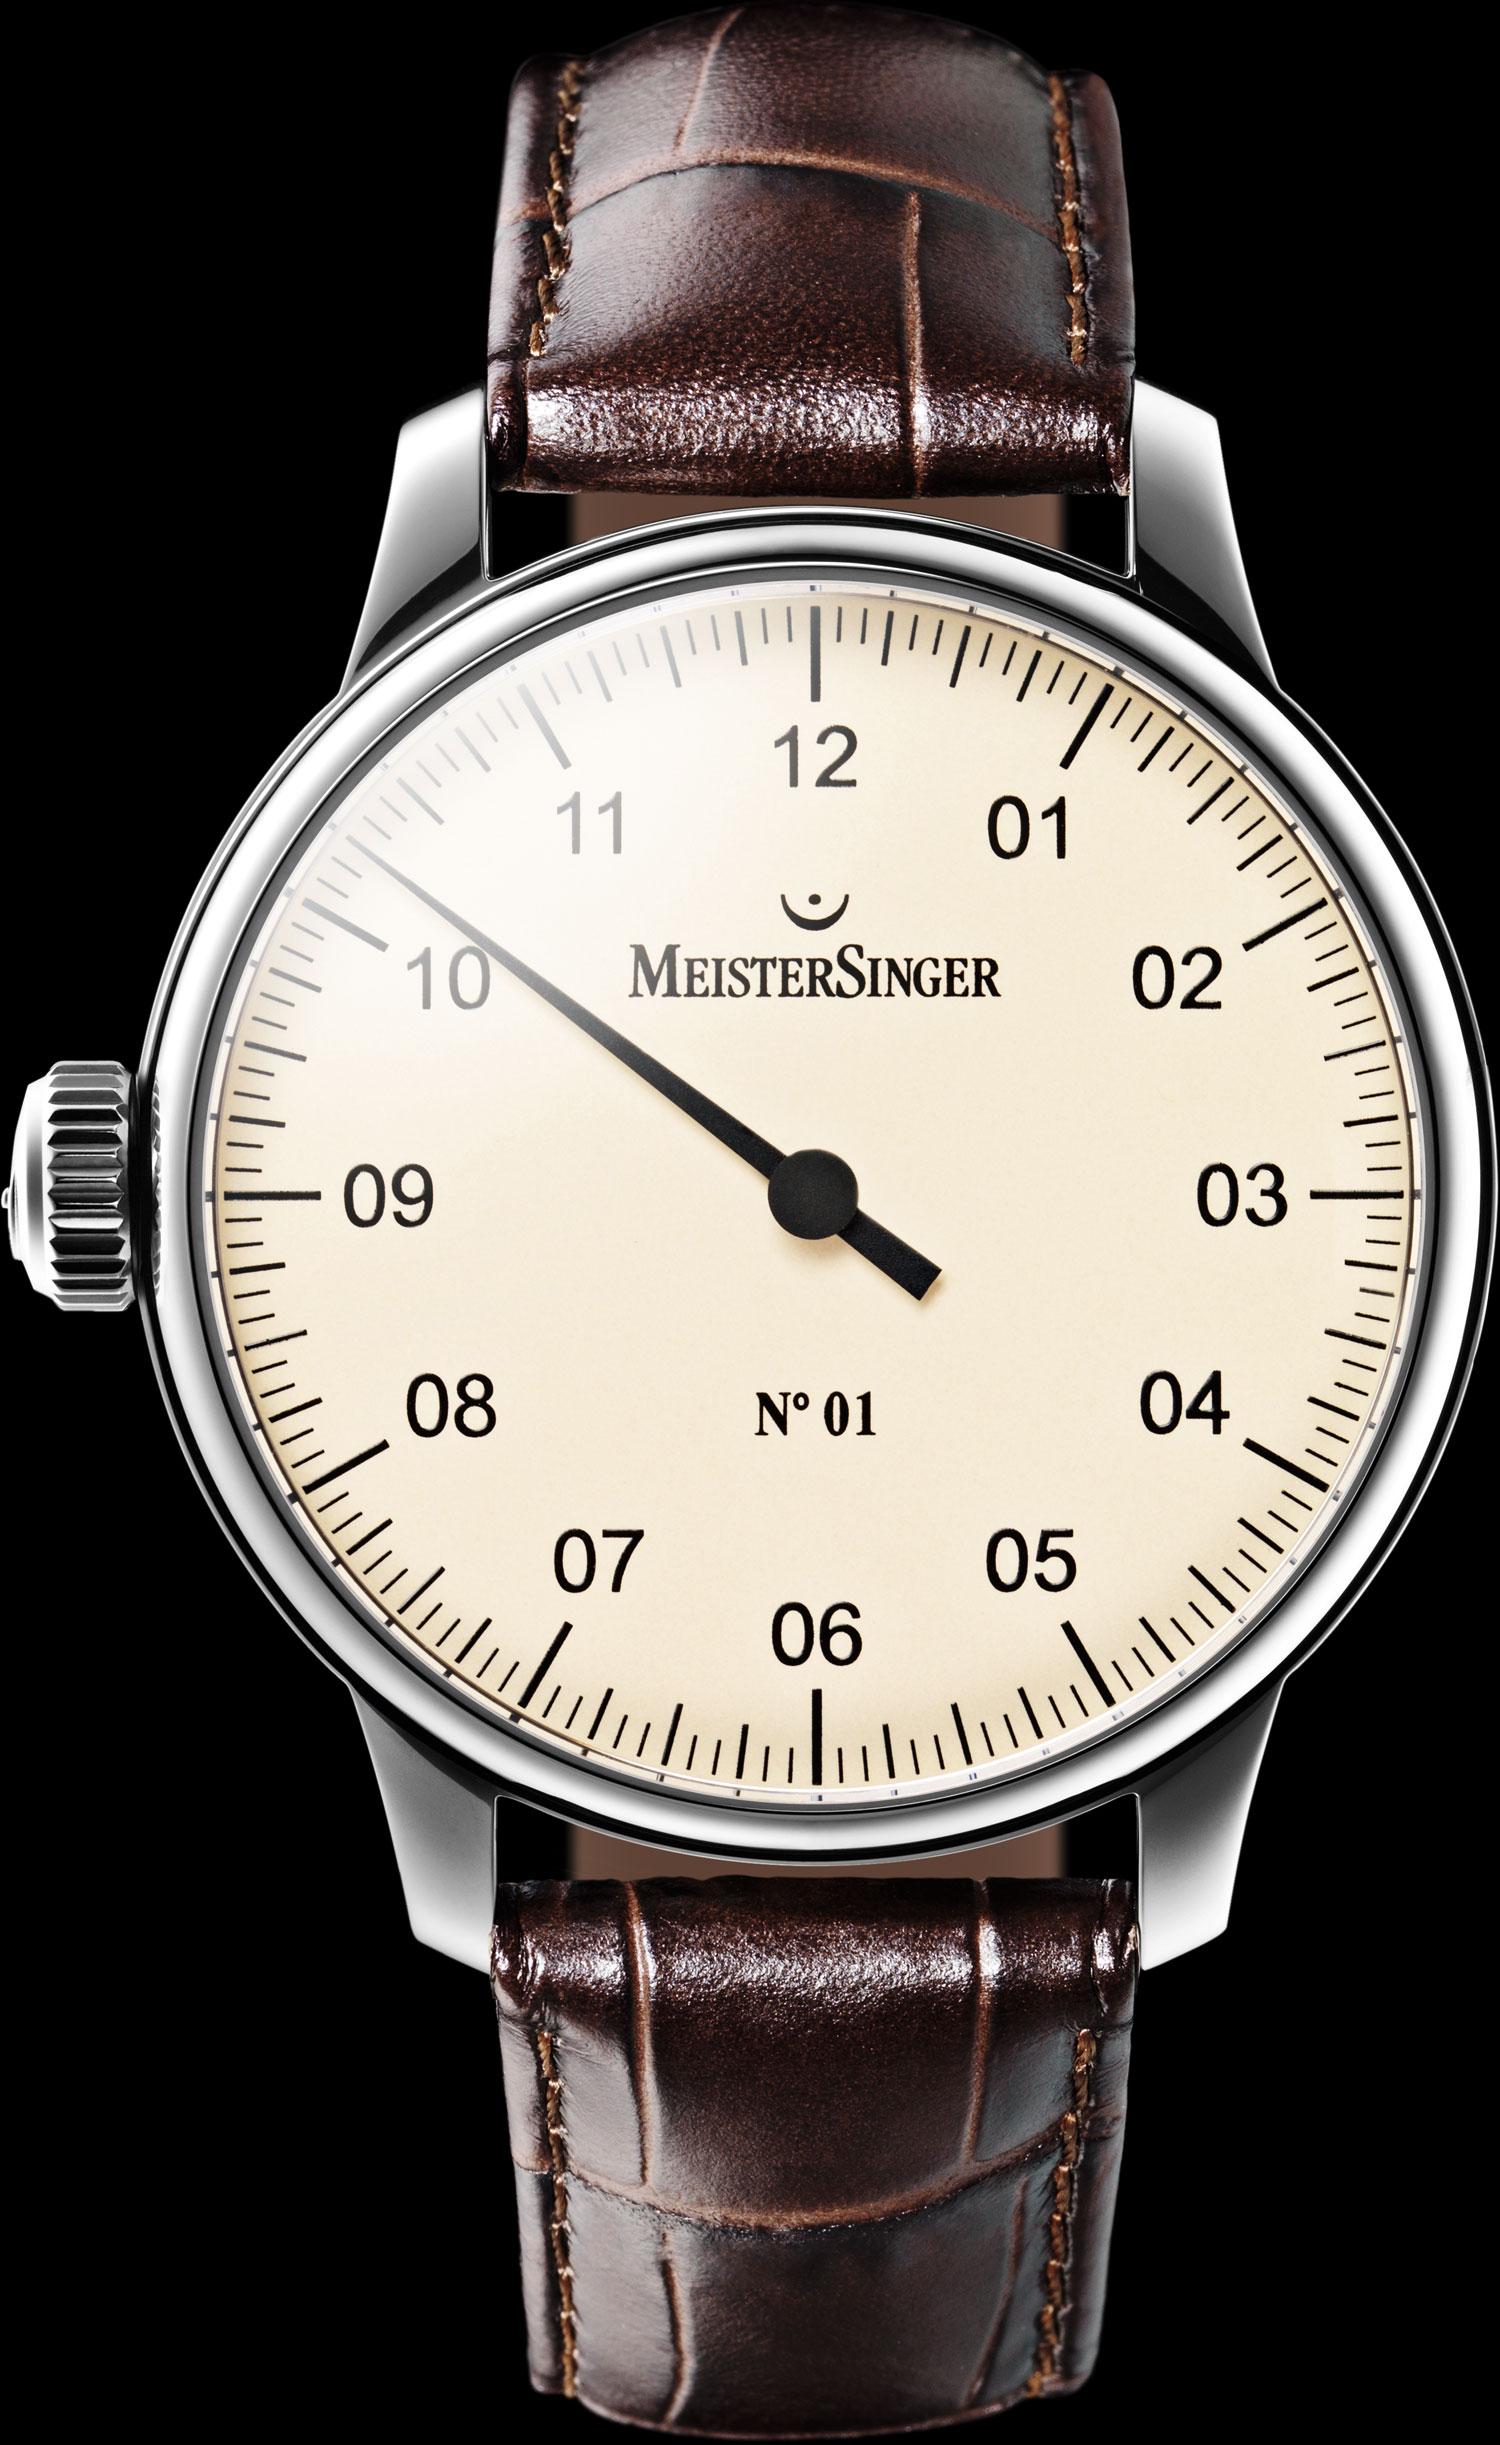 29665c276c6747 BaselWorld 2012: компания MeisterSinger представила новинки